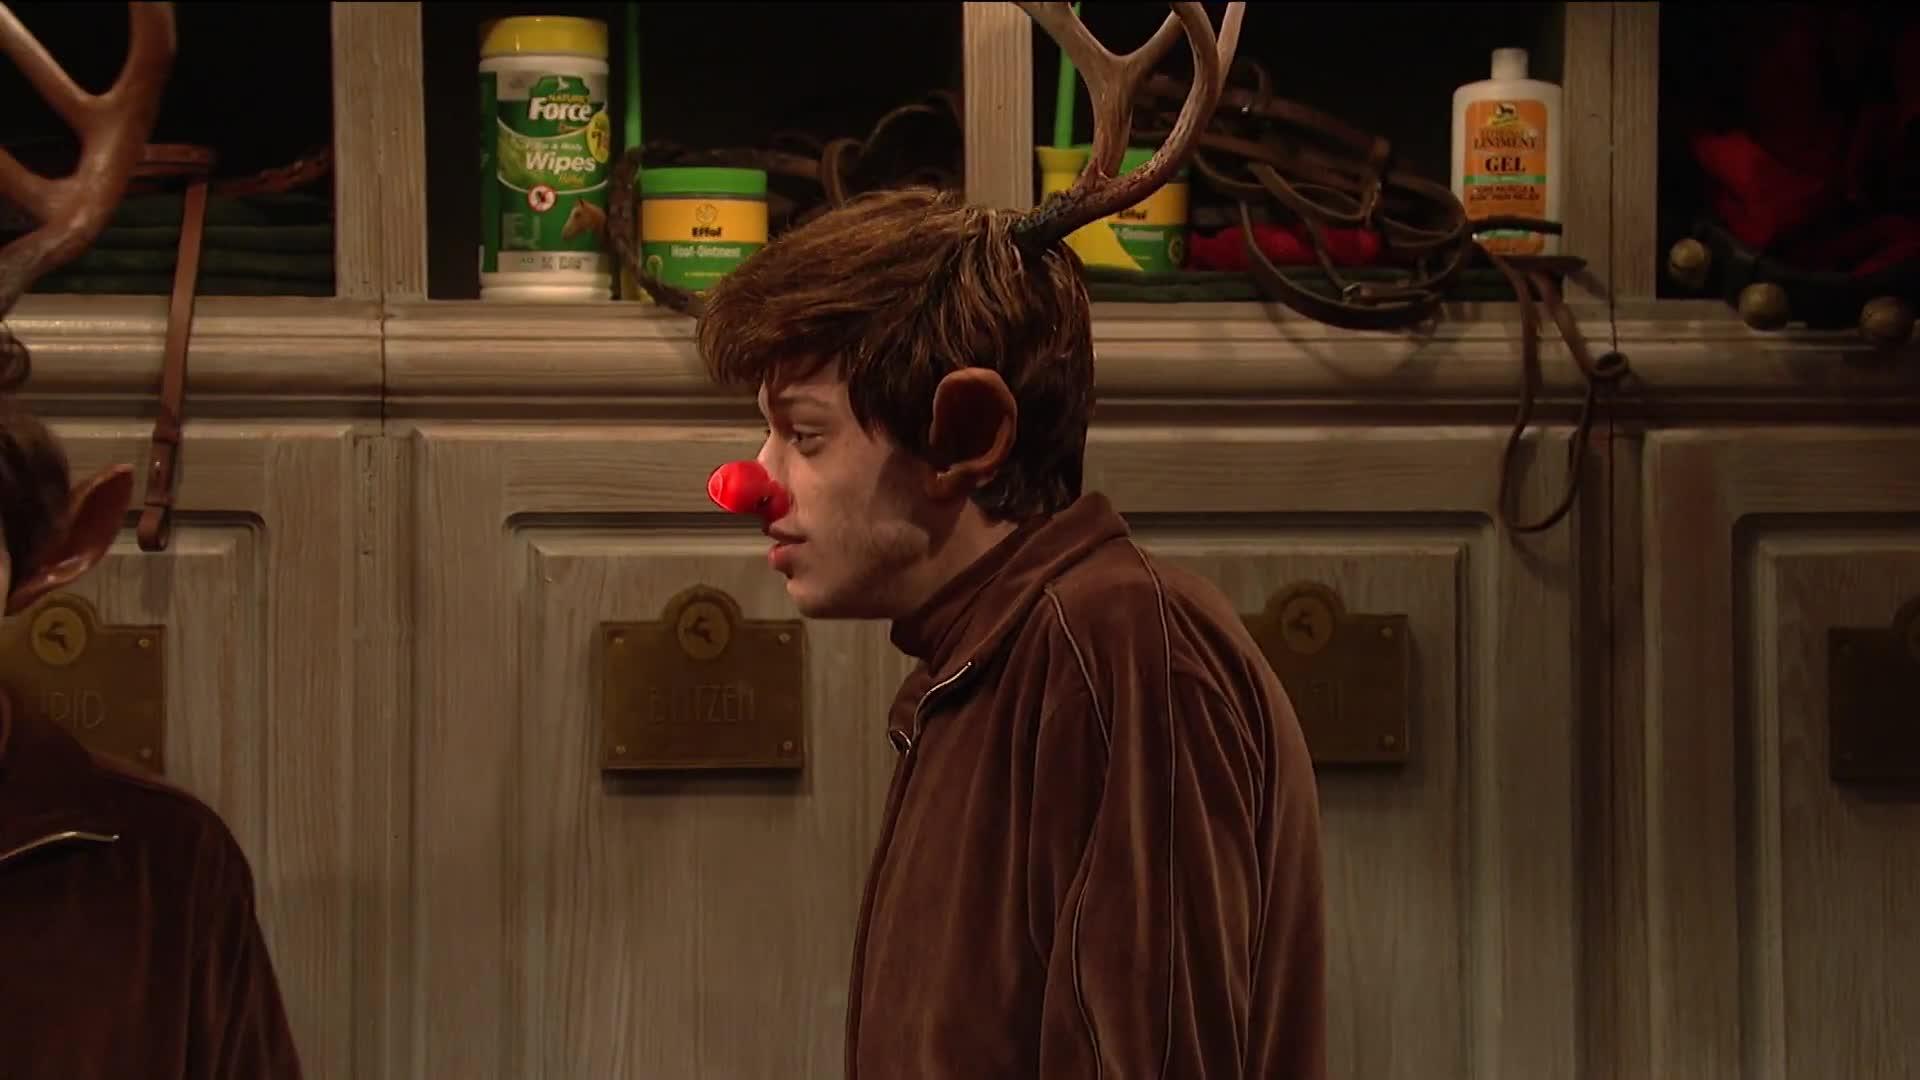 beck bennett, jason momoa, mikey day, nbc, pete davidson, saturday night live, season 44, snl, snl 44, snl season 44, Rudolph's Big Night - SNL GIFs